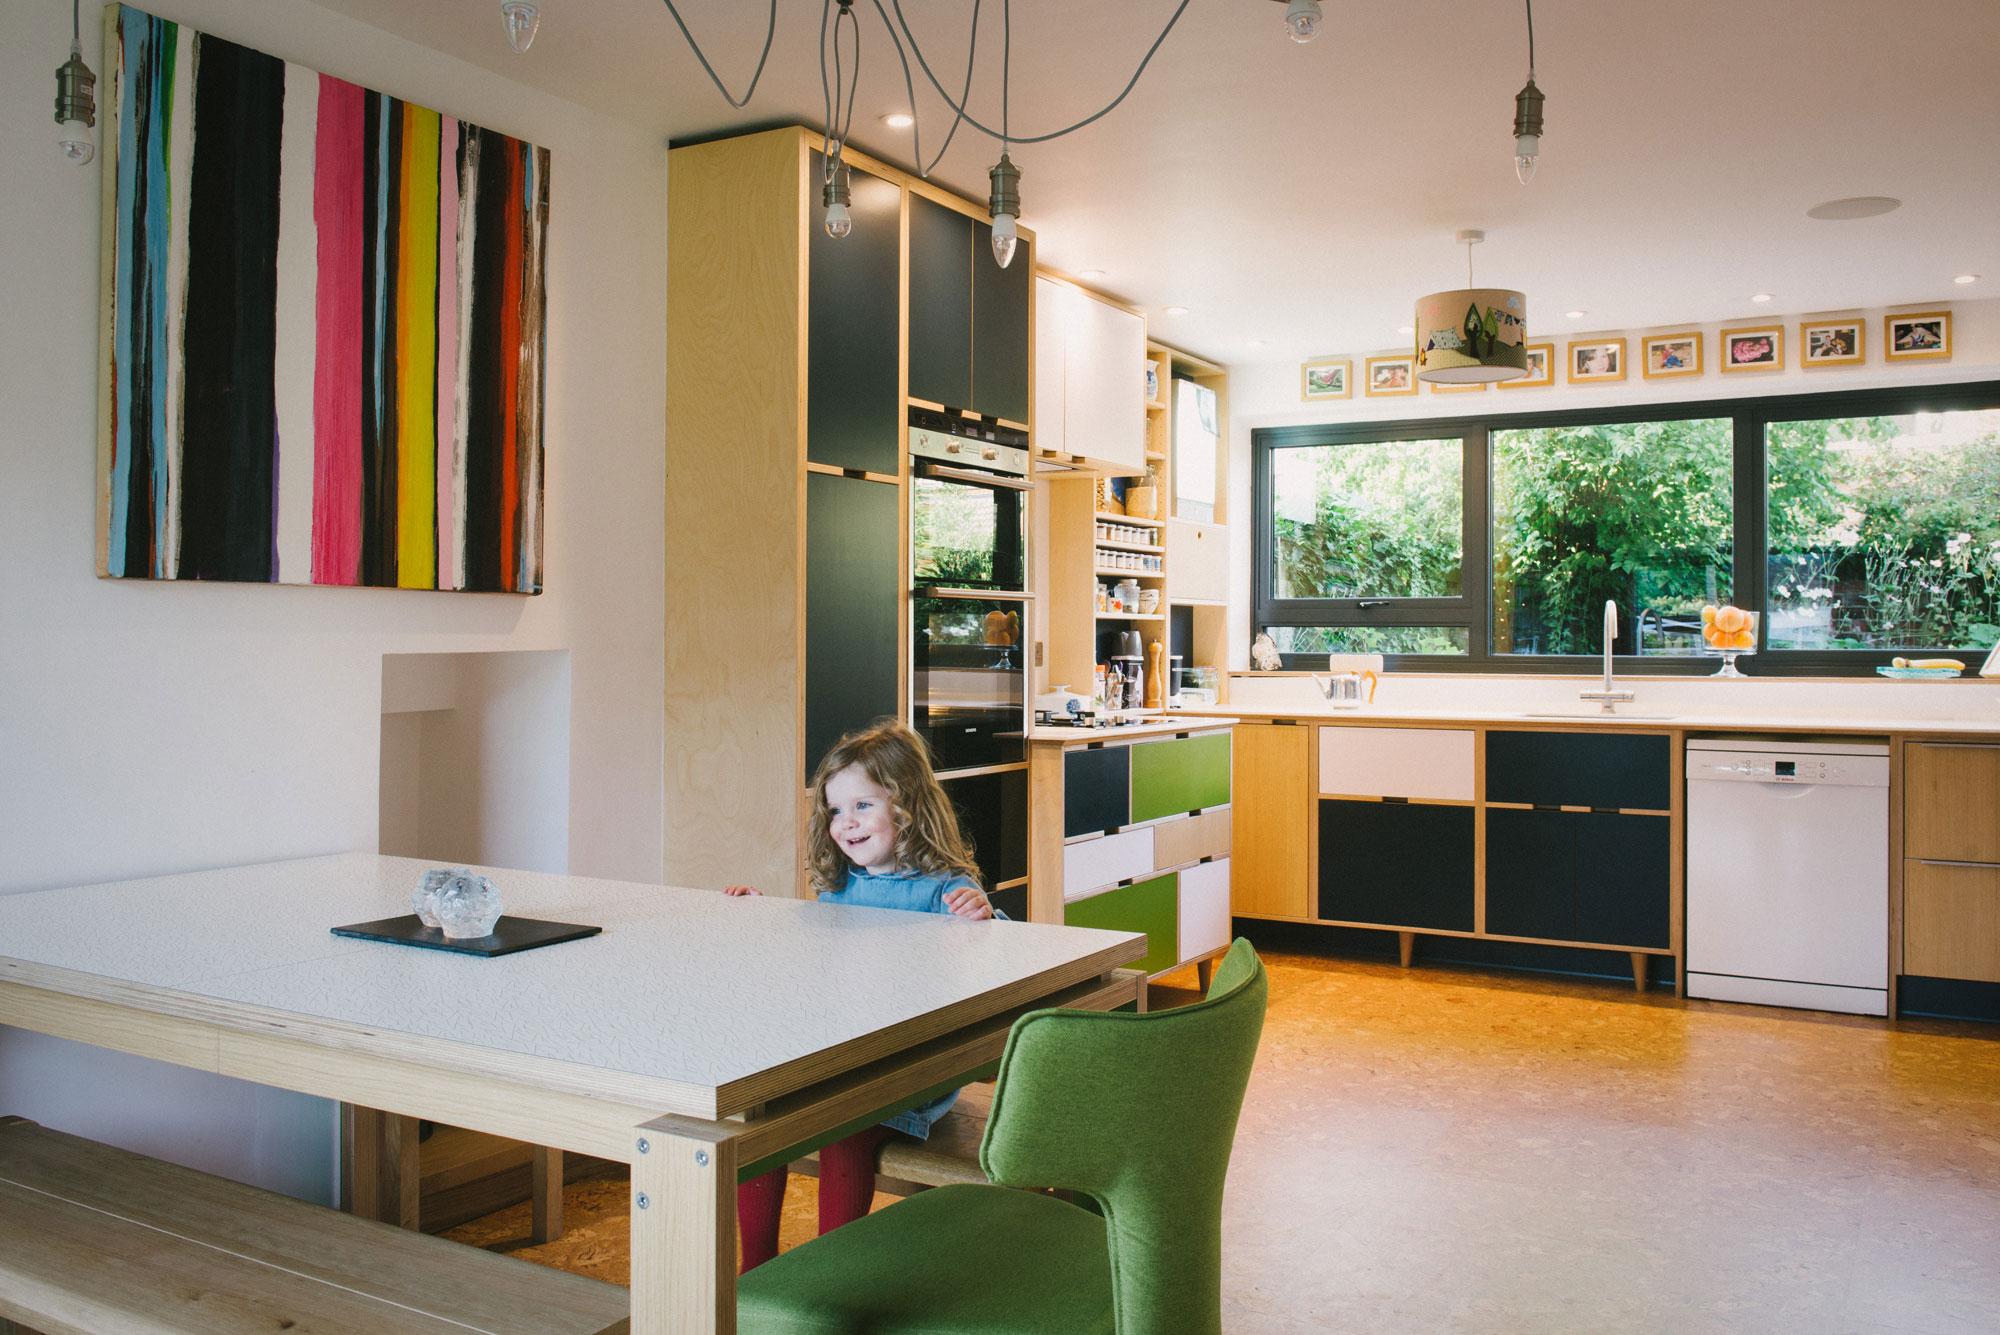 Little girl smiling in bespoke plywood kitchen